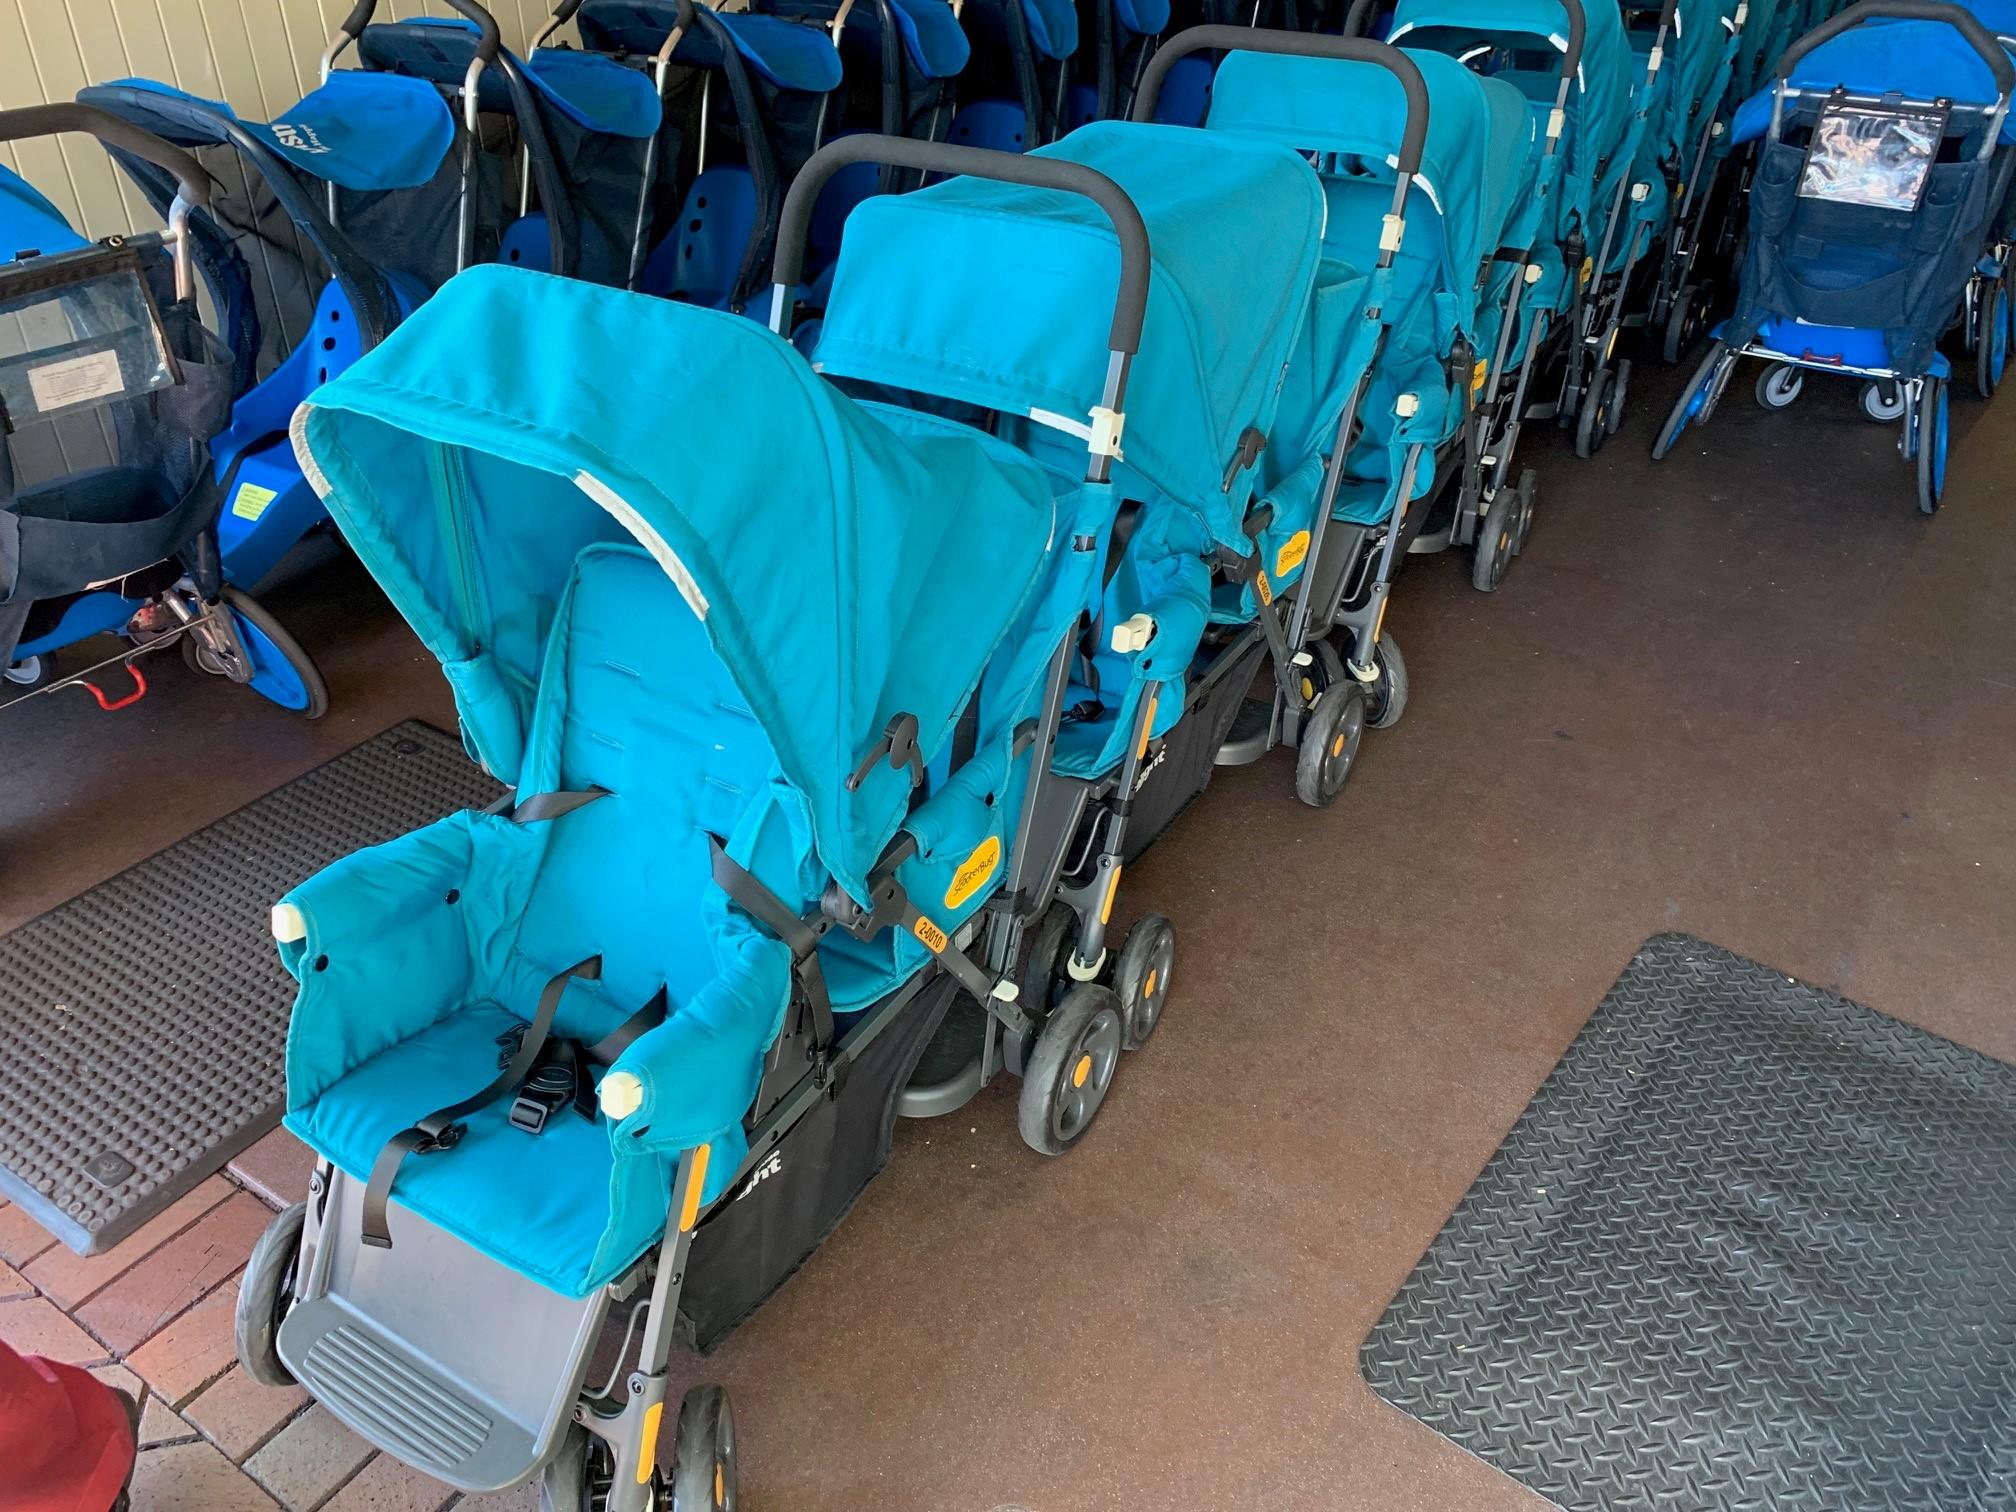 Disneyland Debuts New Double Seat Rental Strollers to ...